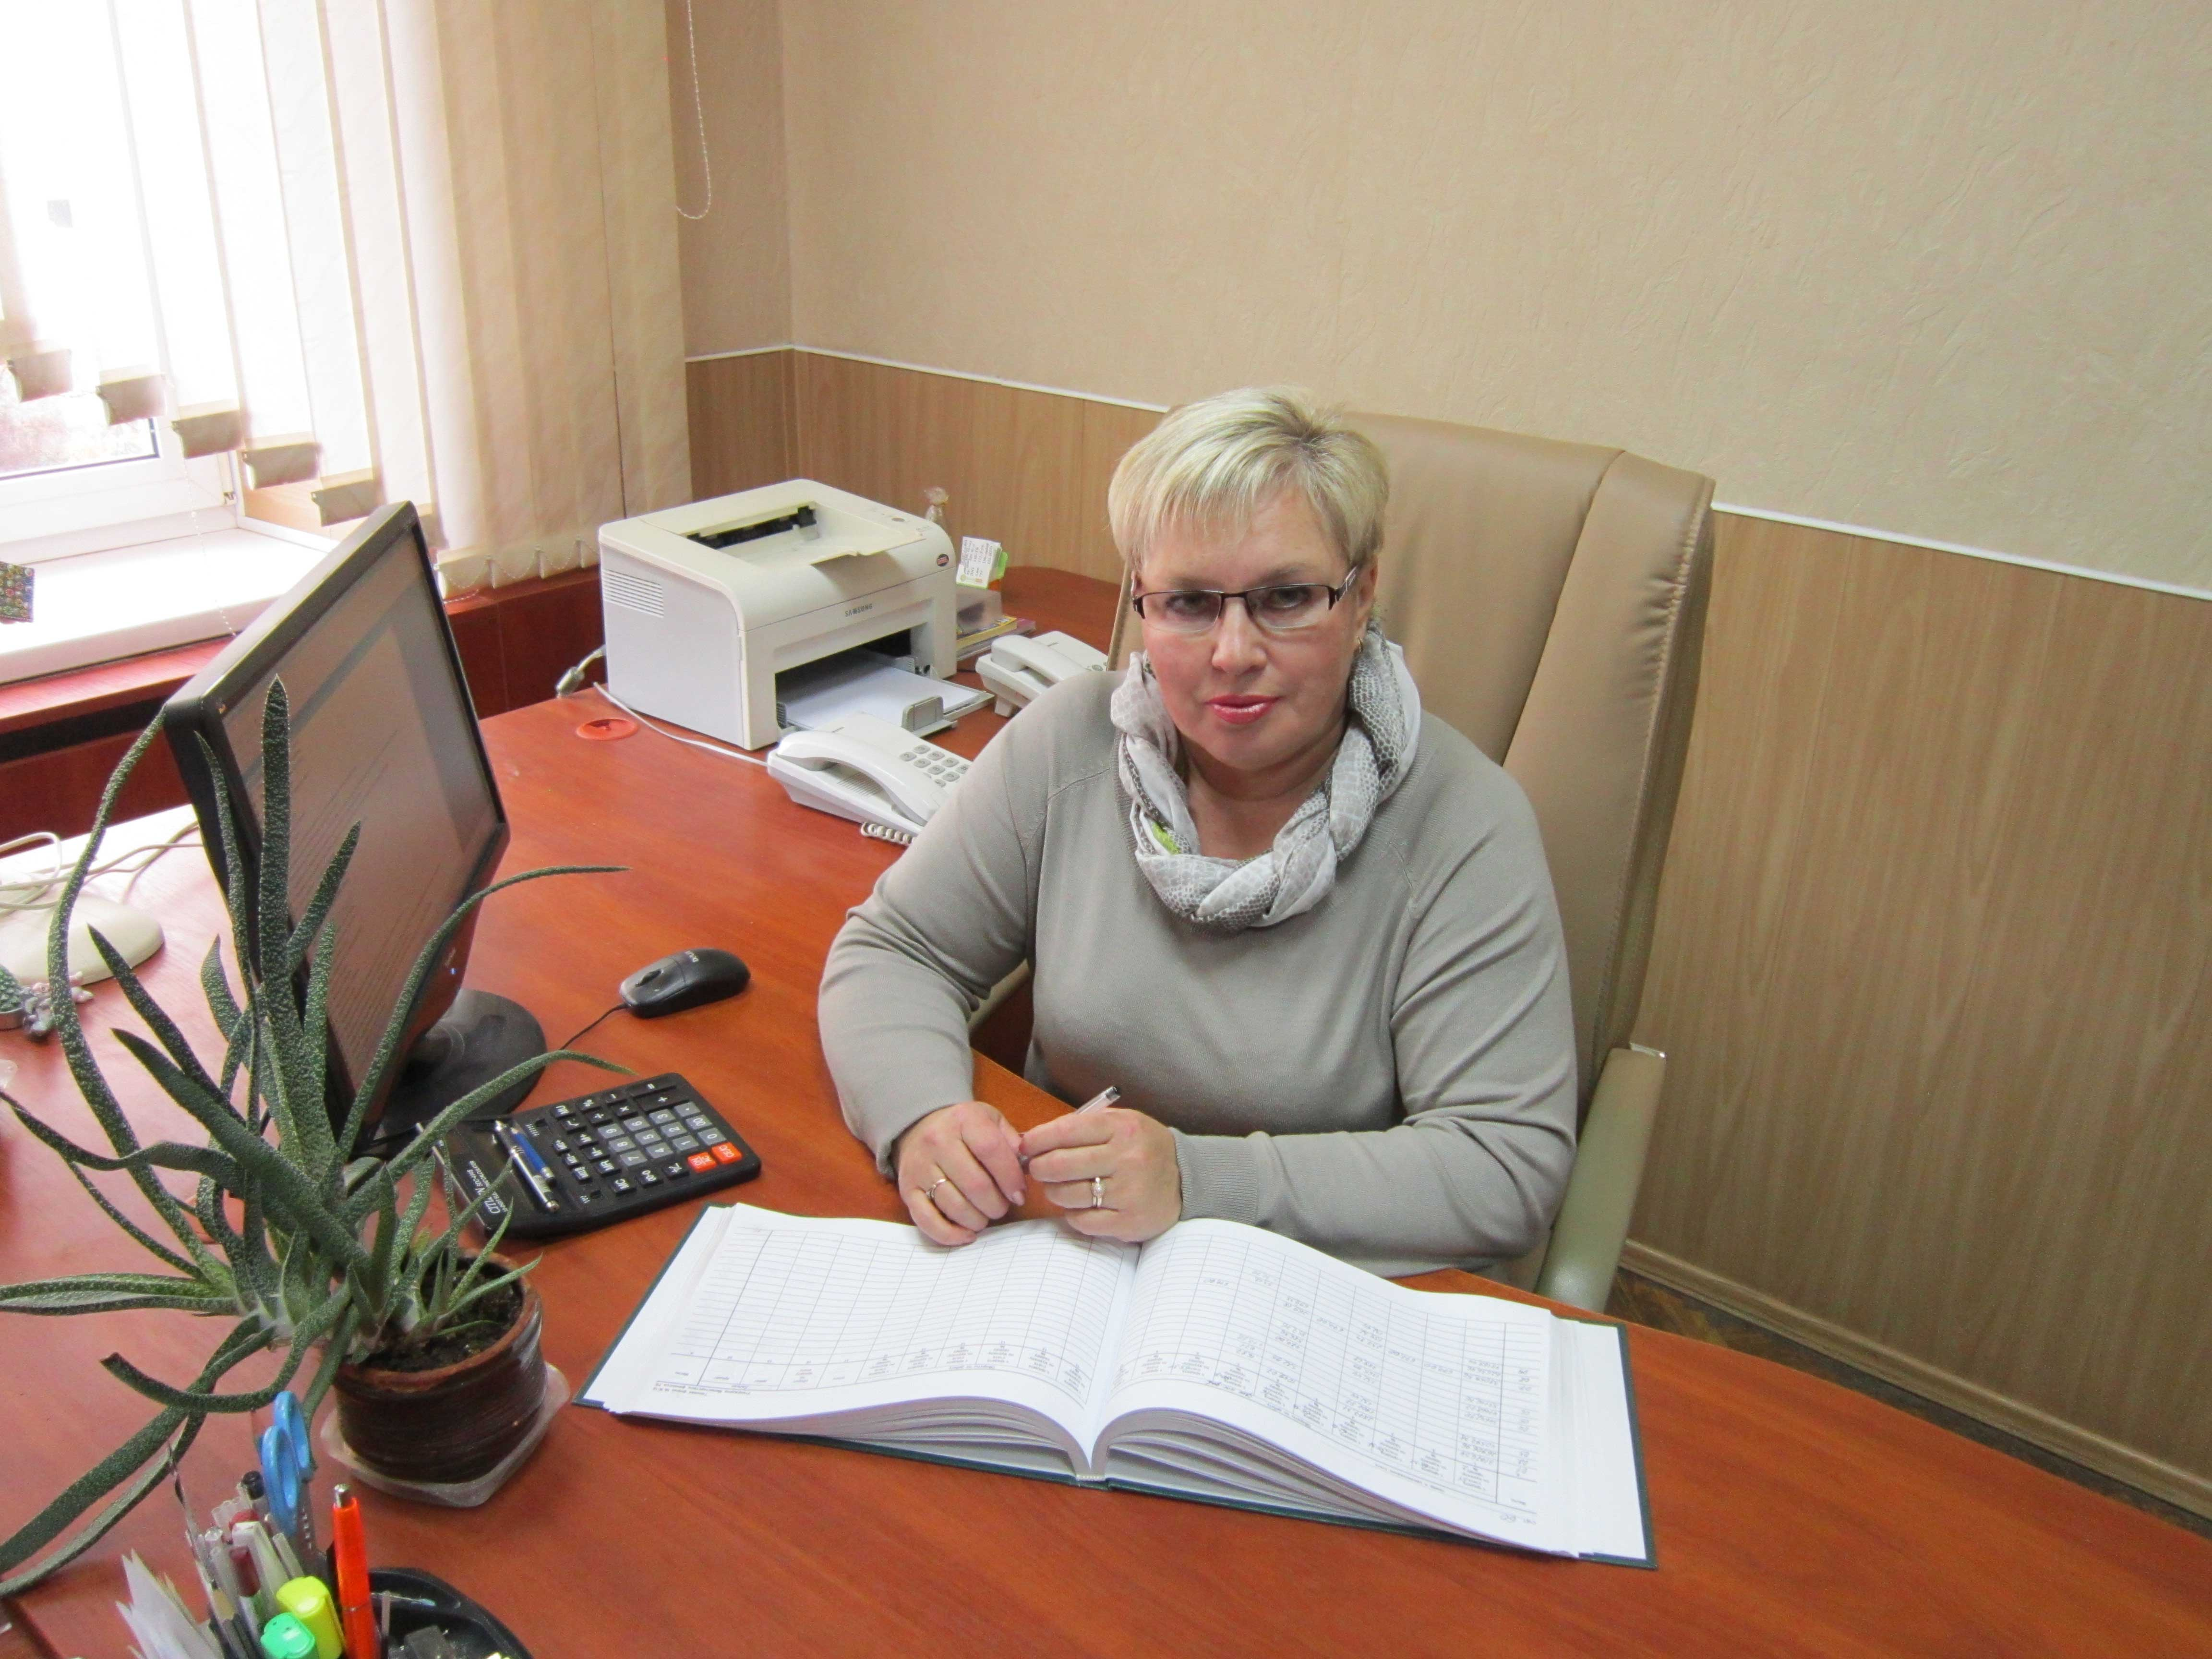 Тараканова татьяна анатольевна, Татьяна Анатольевна Тараканова(Сыченикова) 14 фотография